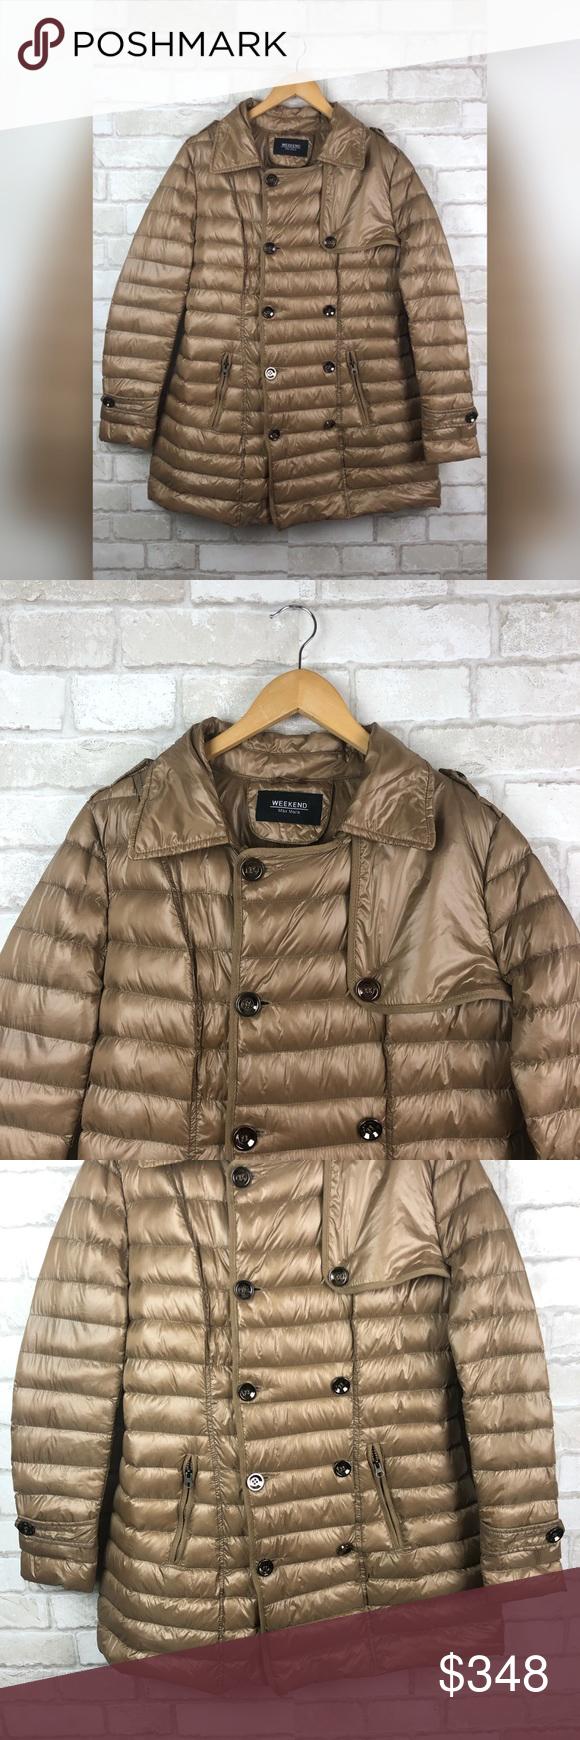 Weekend Max Mara Feather Down Puffer Jacket Clothes Design Jackets Puffer Jackets [ 1740 x 580 Pixel ]